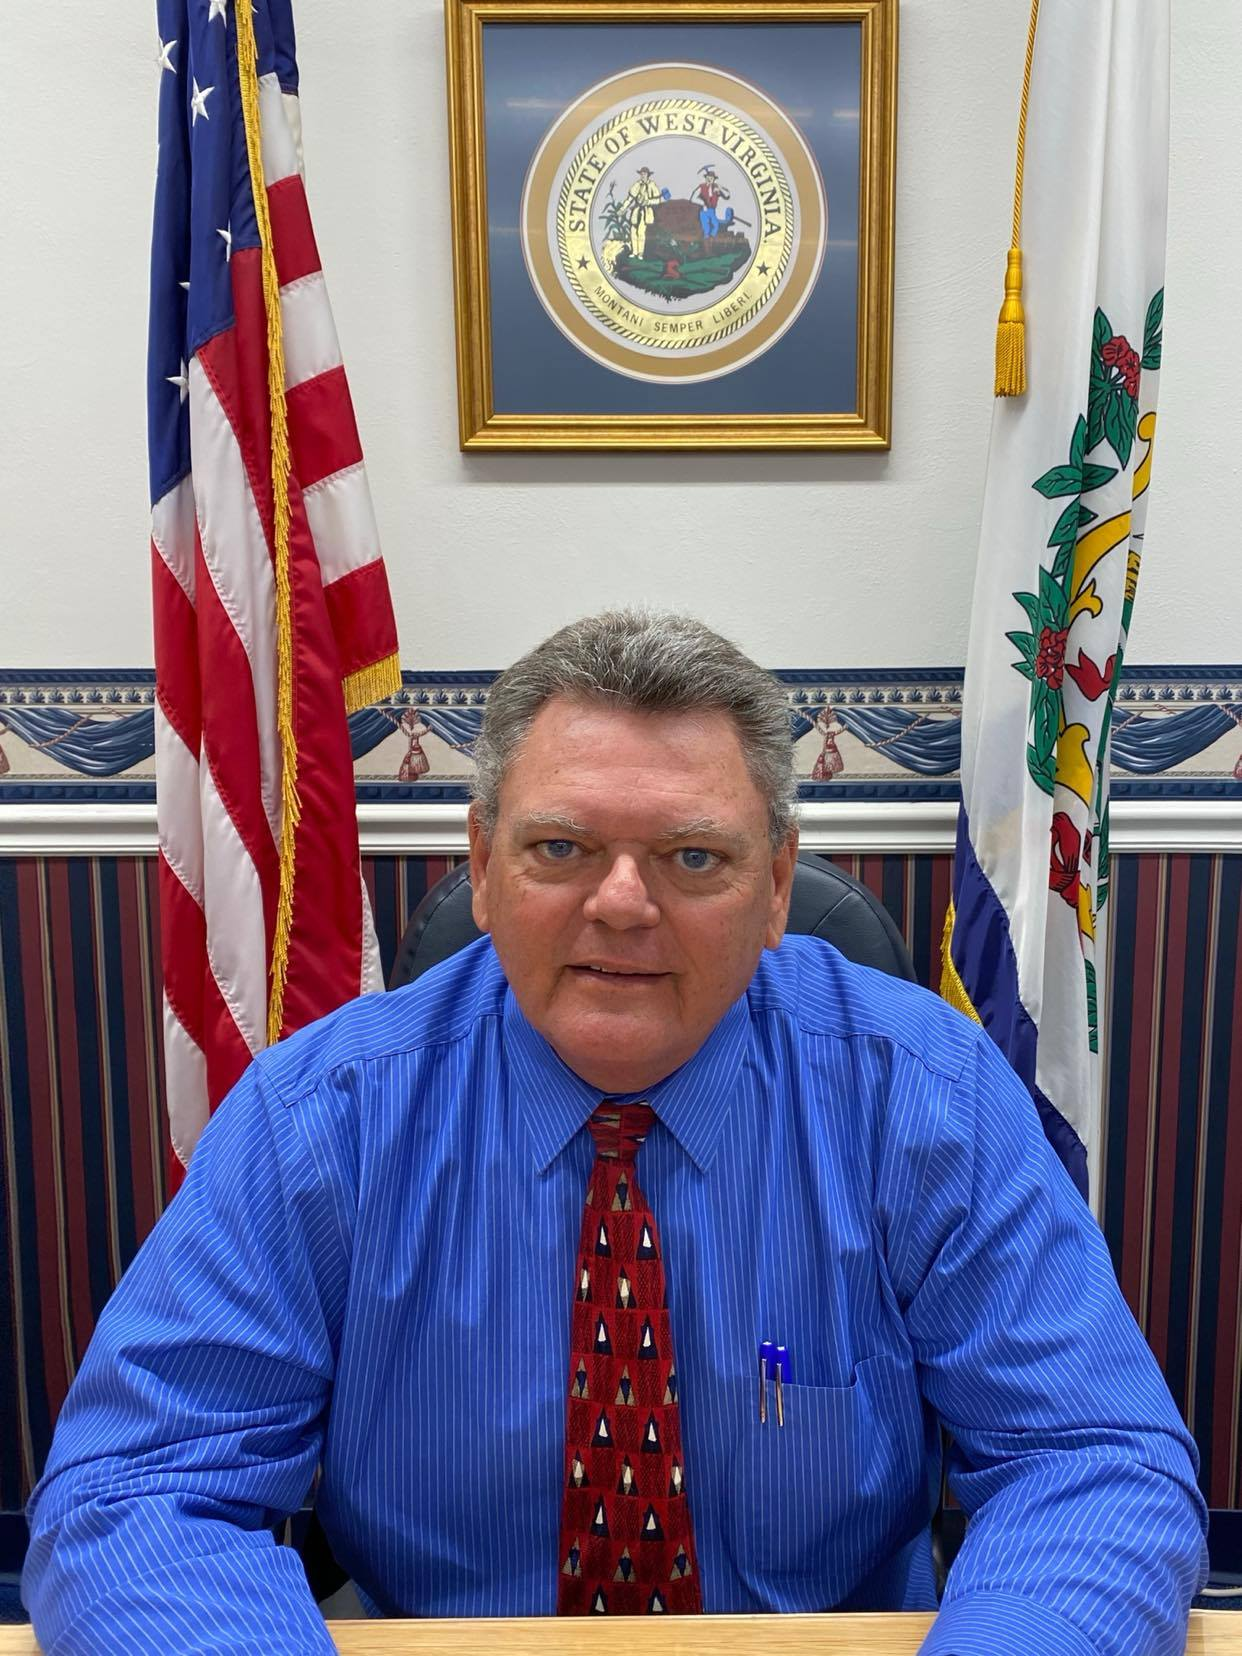 John D. Gerlach